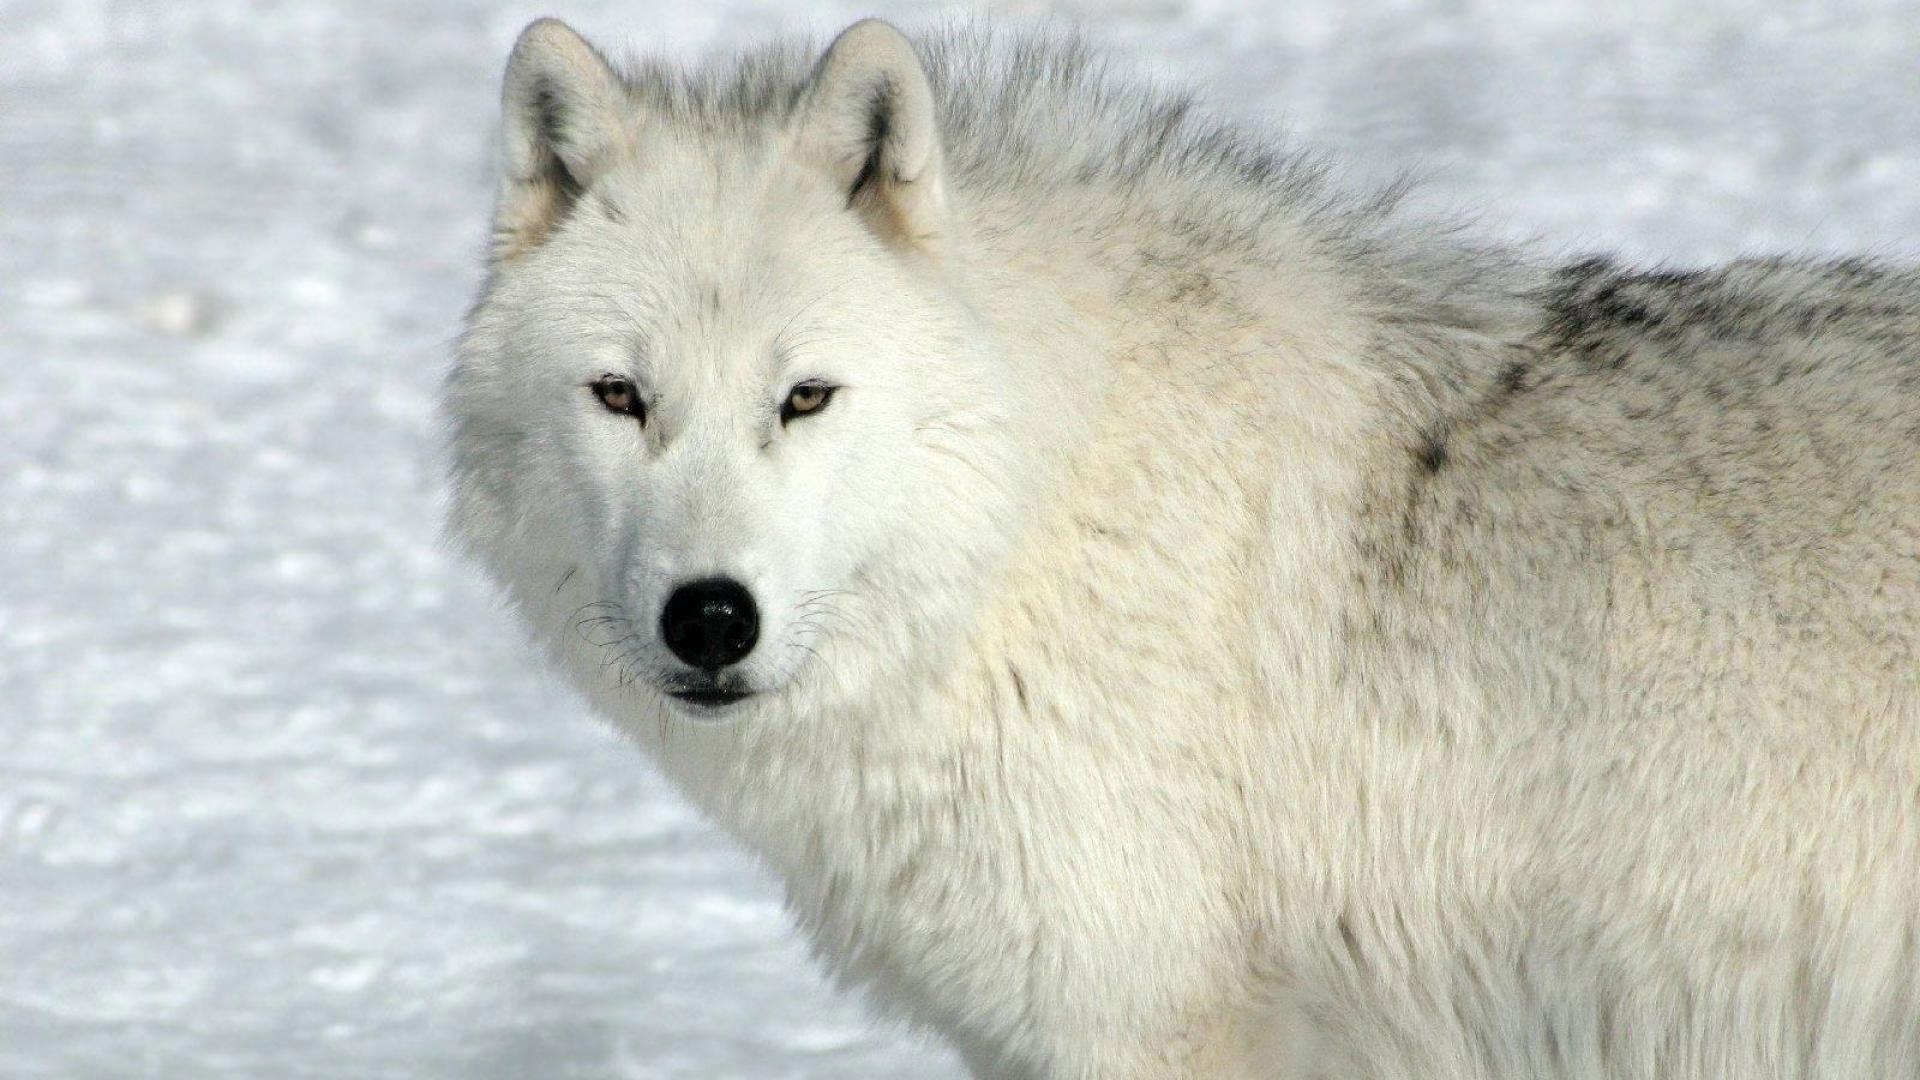 hd pics photos cute white wolf snow ice attractive wild animals hd quality desktop  background wallpaper